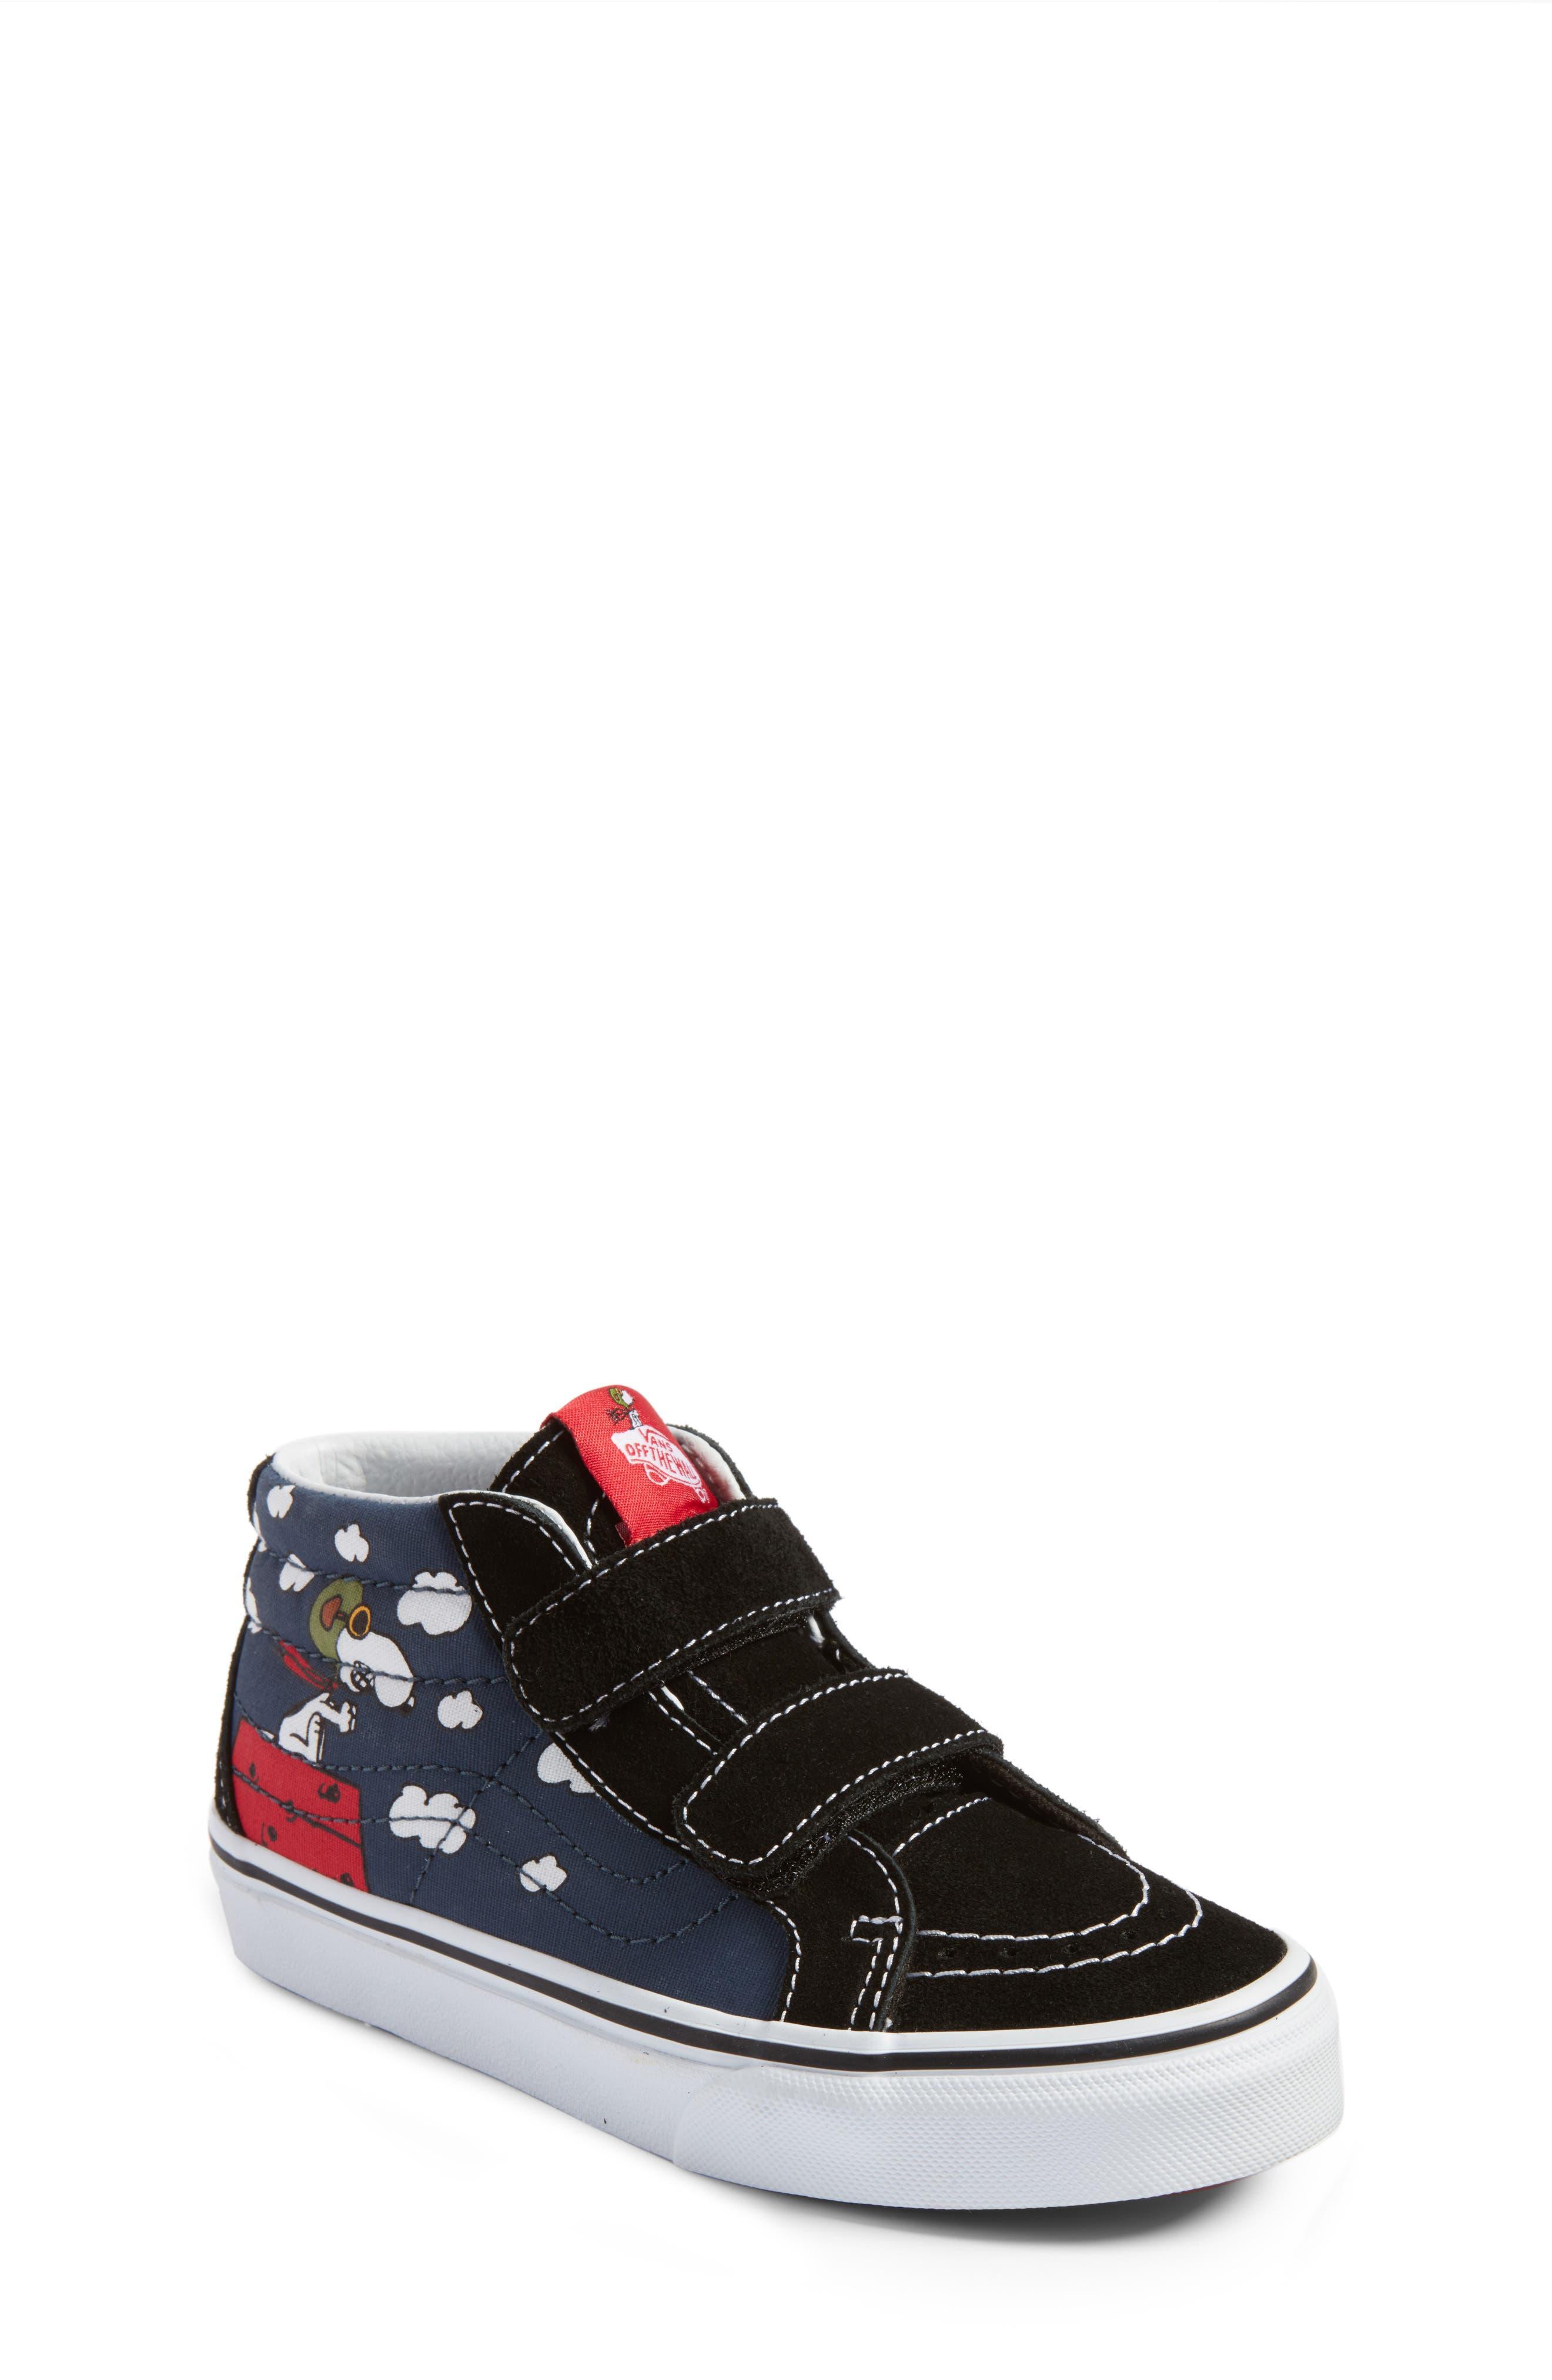 Vans x Peanuts SK8-Mid Reissue V Sneaker (Toddler, Little Kid & Big Kid)